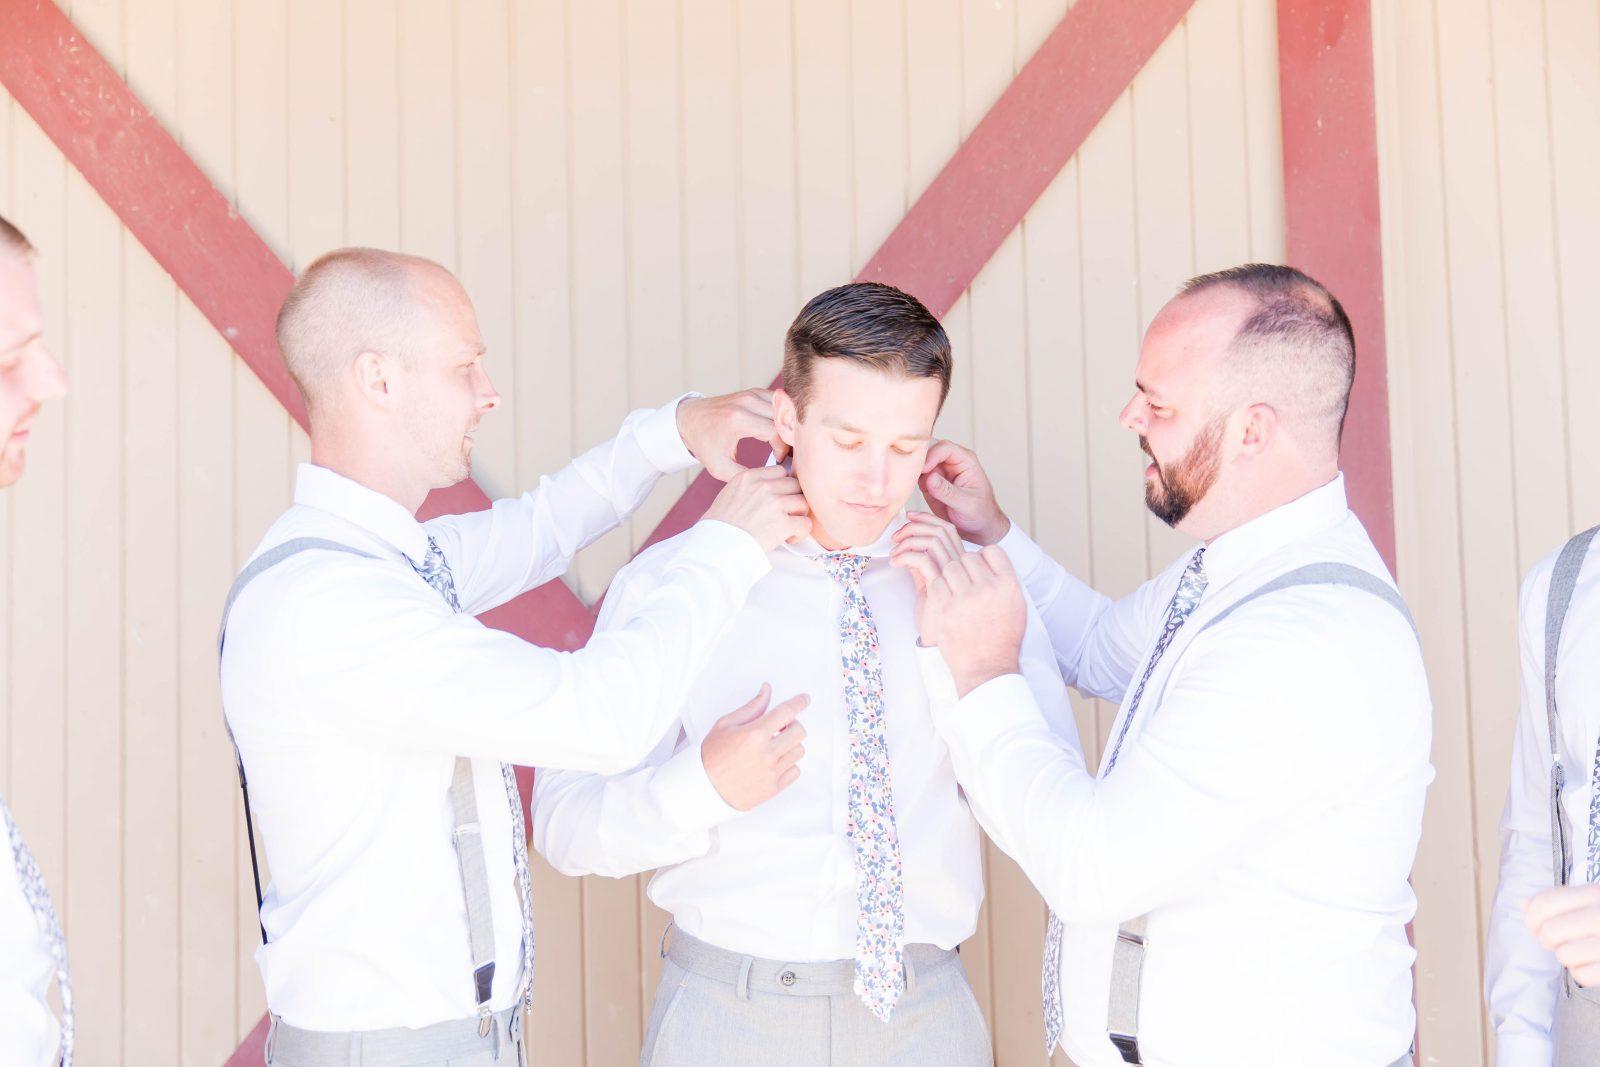 peacock-ridge-summer-wedding-photographer-akron-ohio-loren-jackson-photography-16